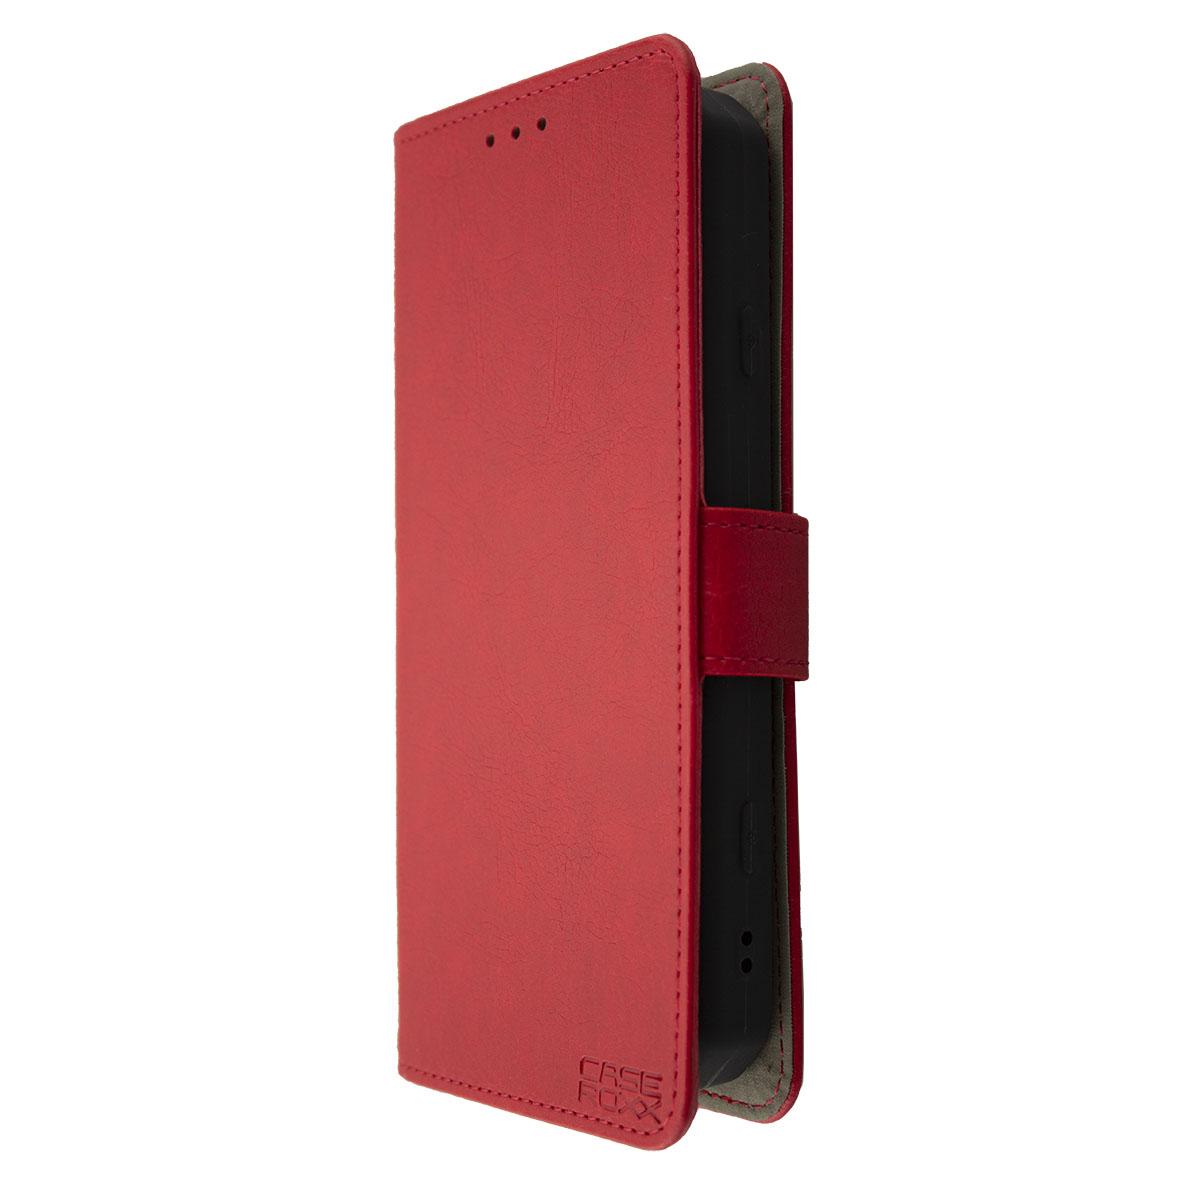 caseroxx-Bookstyle-Case-for-Blackview-BV9500-BV9500-Pro-BV9500-Plus-made-of thumbnail 10